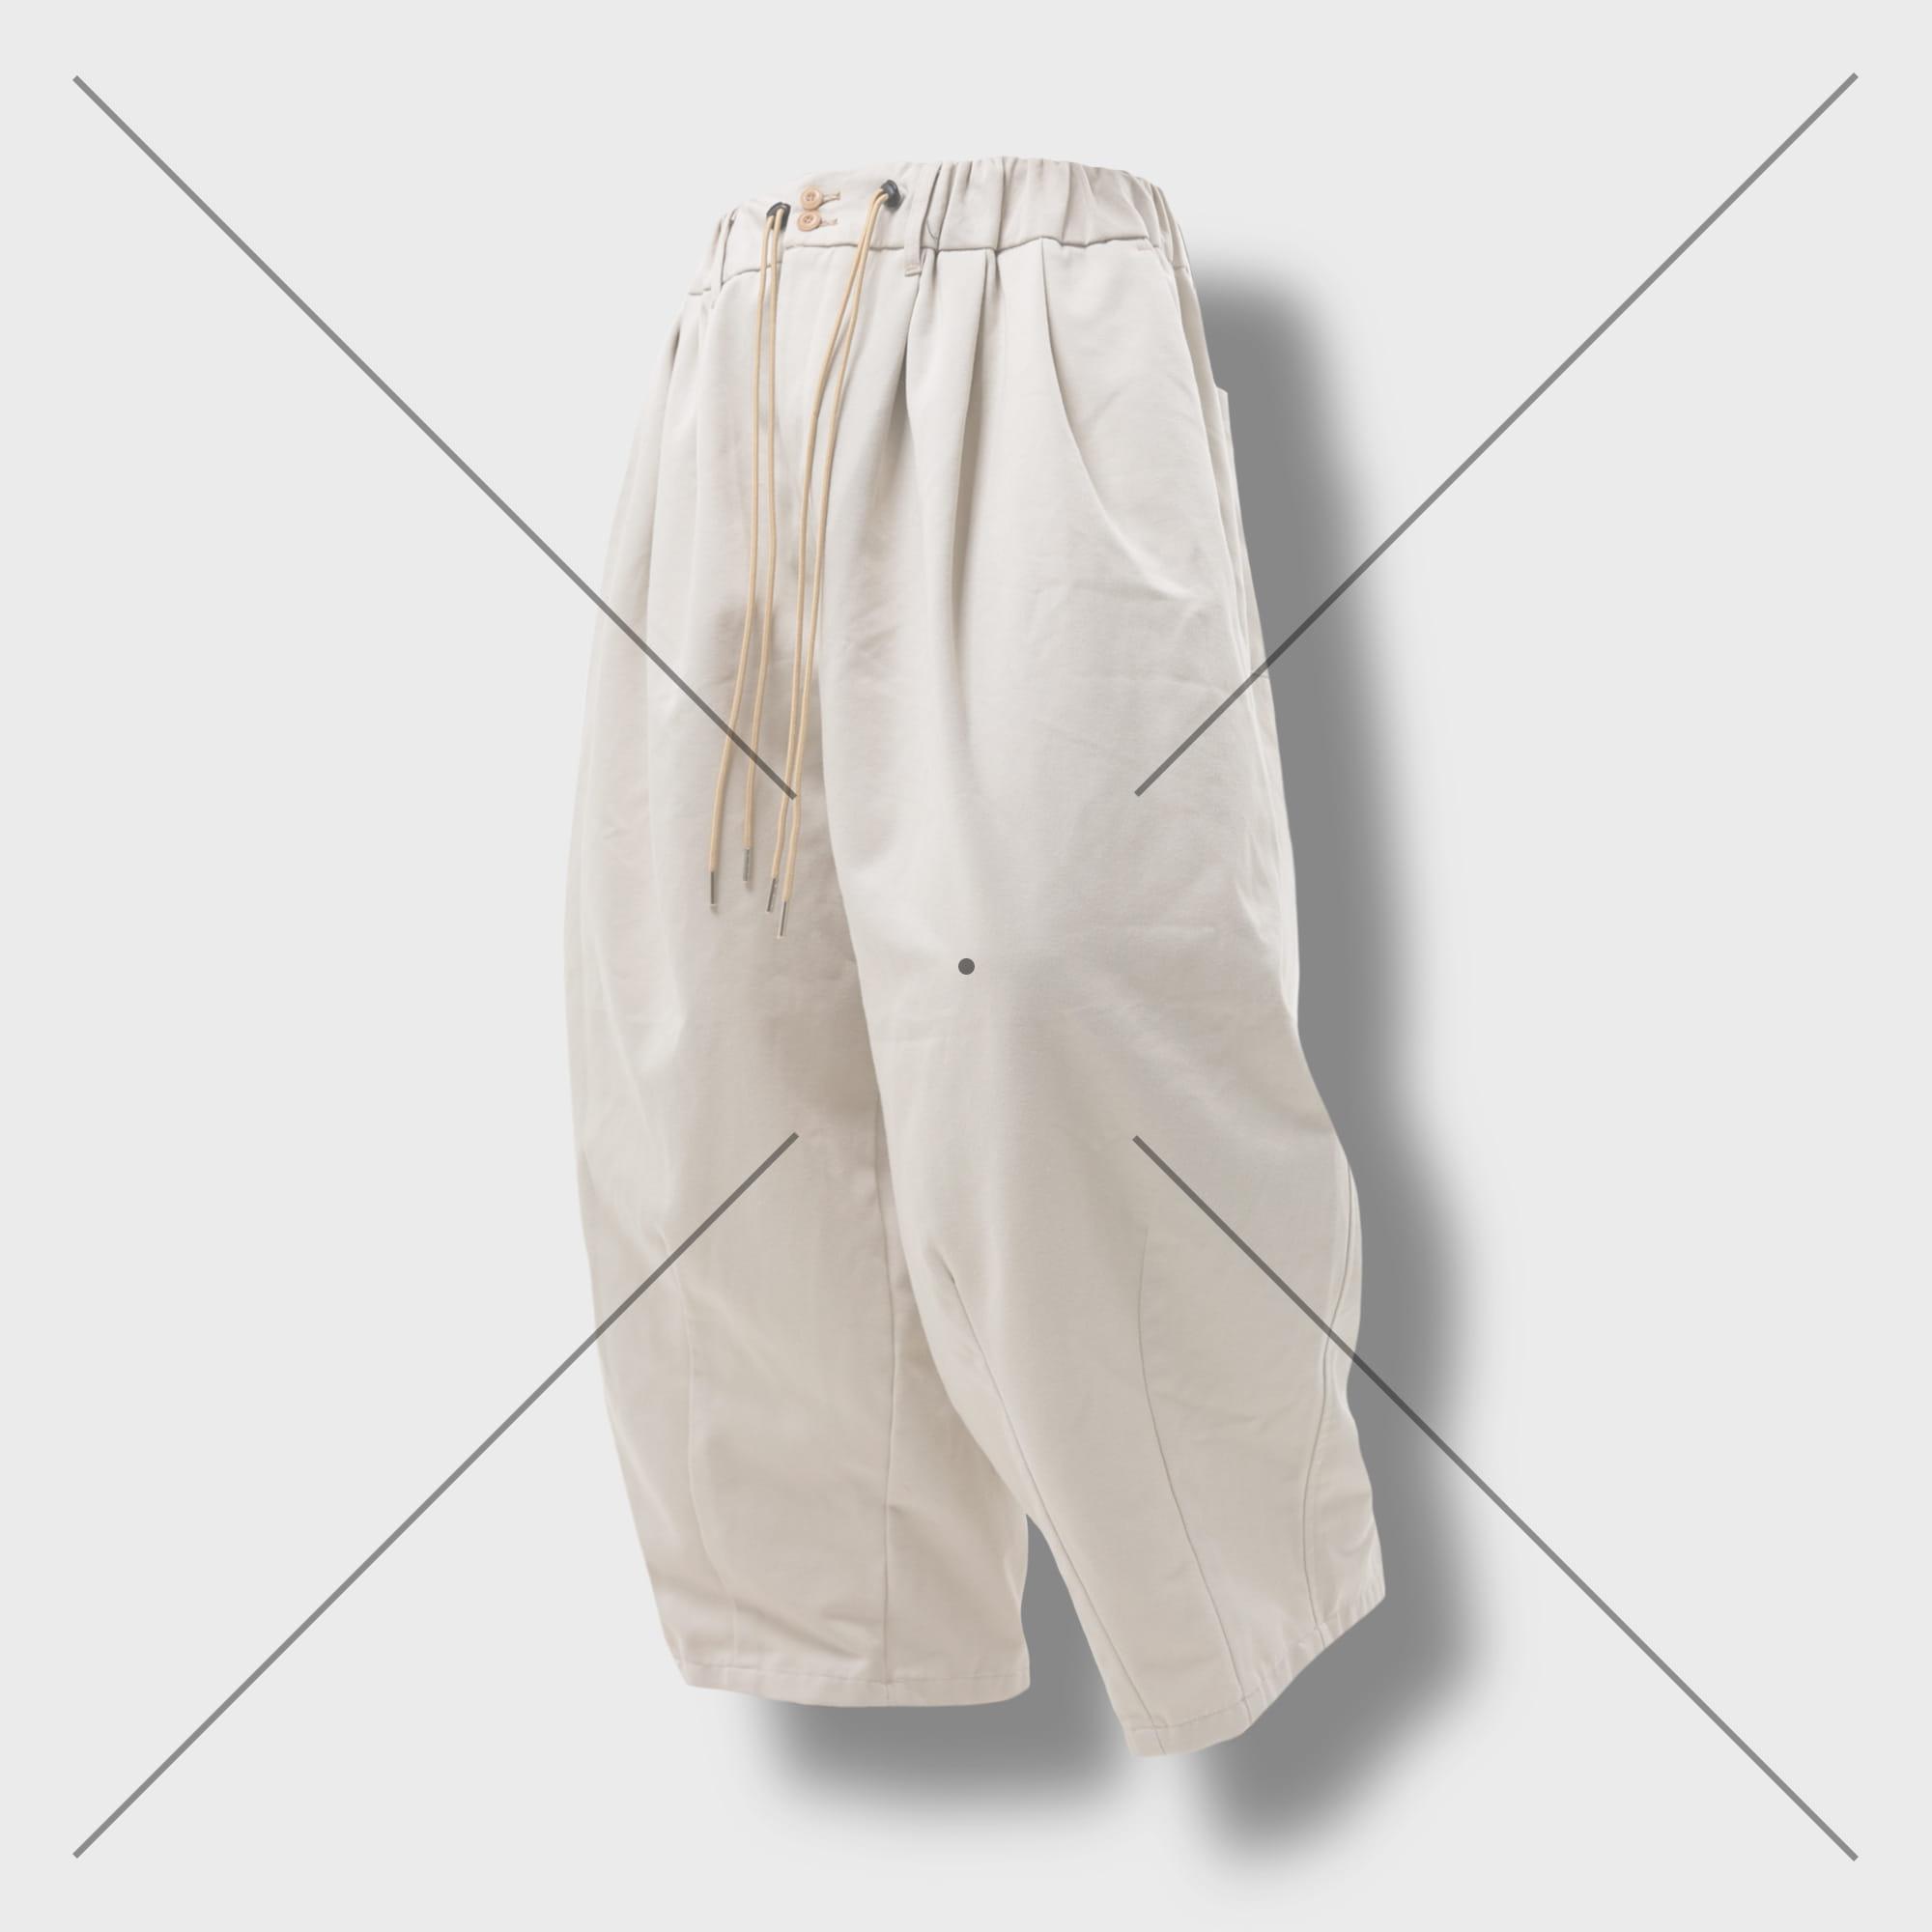 [AG] Ethnic String Balloon Pants - Cream